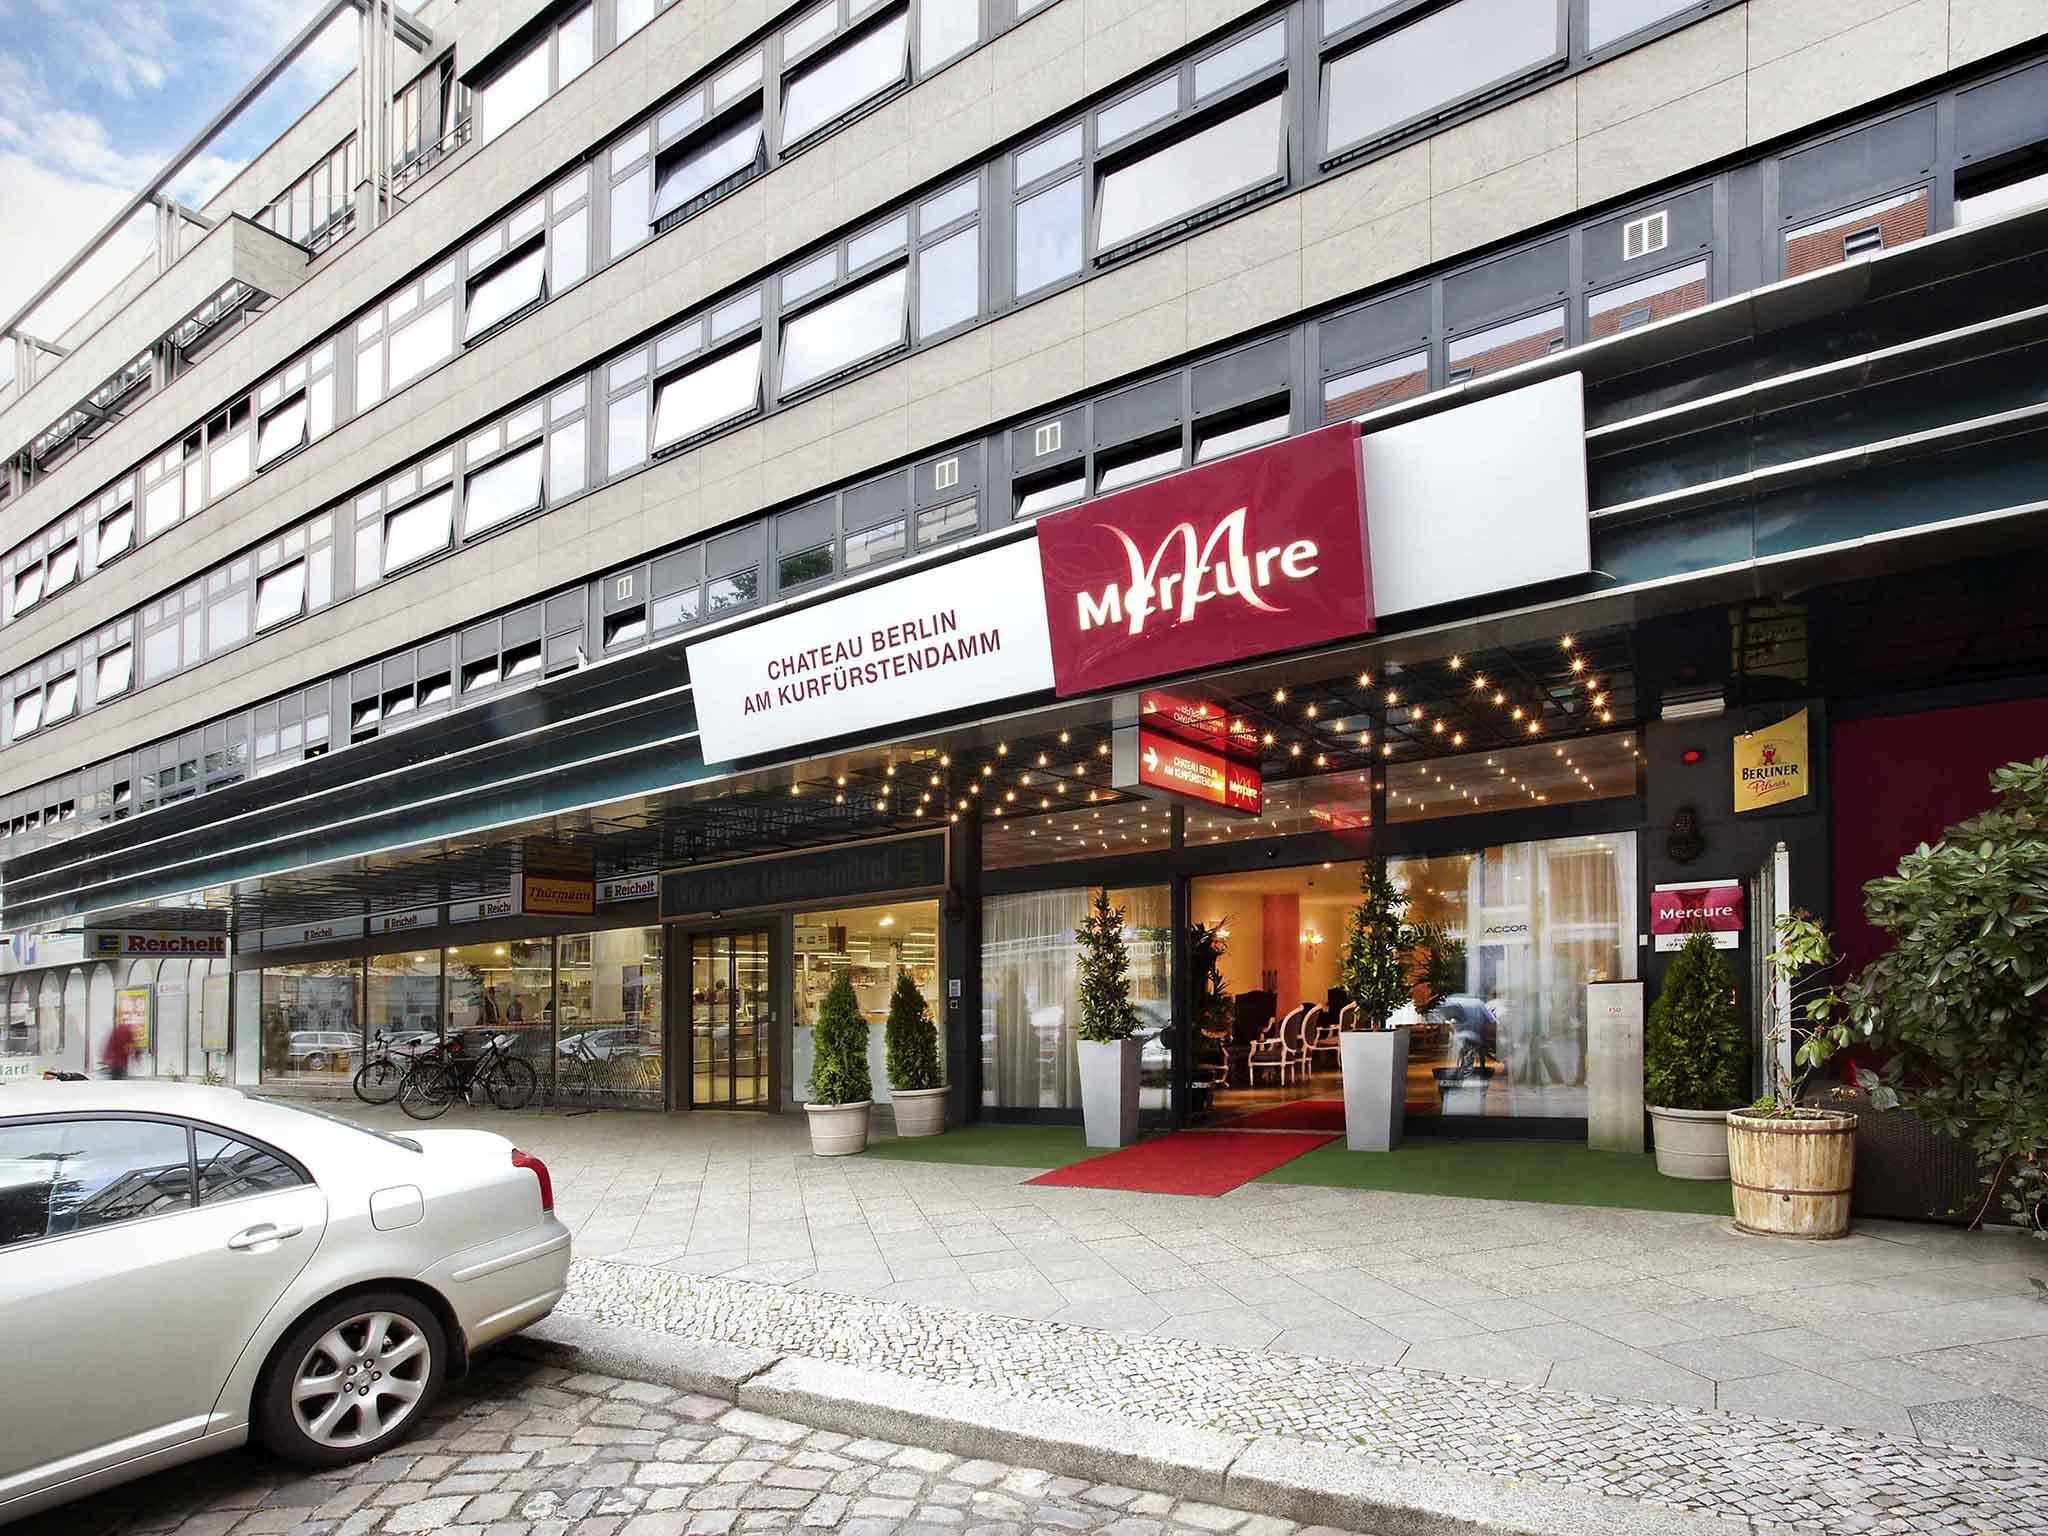 Hotel - Mercure Hotel Chateau Berlin am Kurfuerstendamm